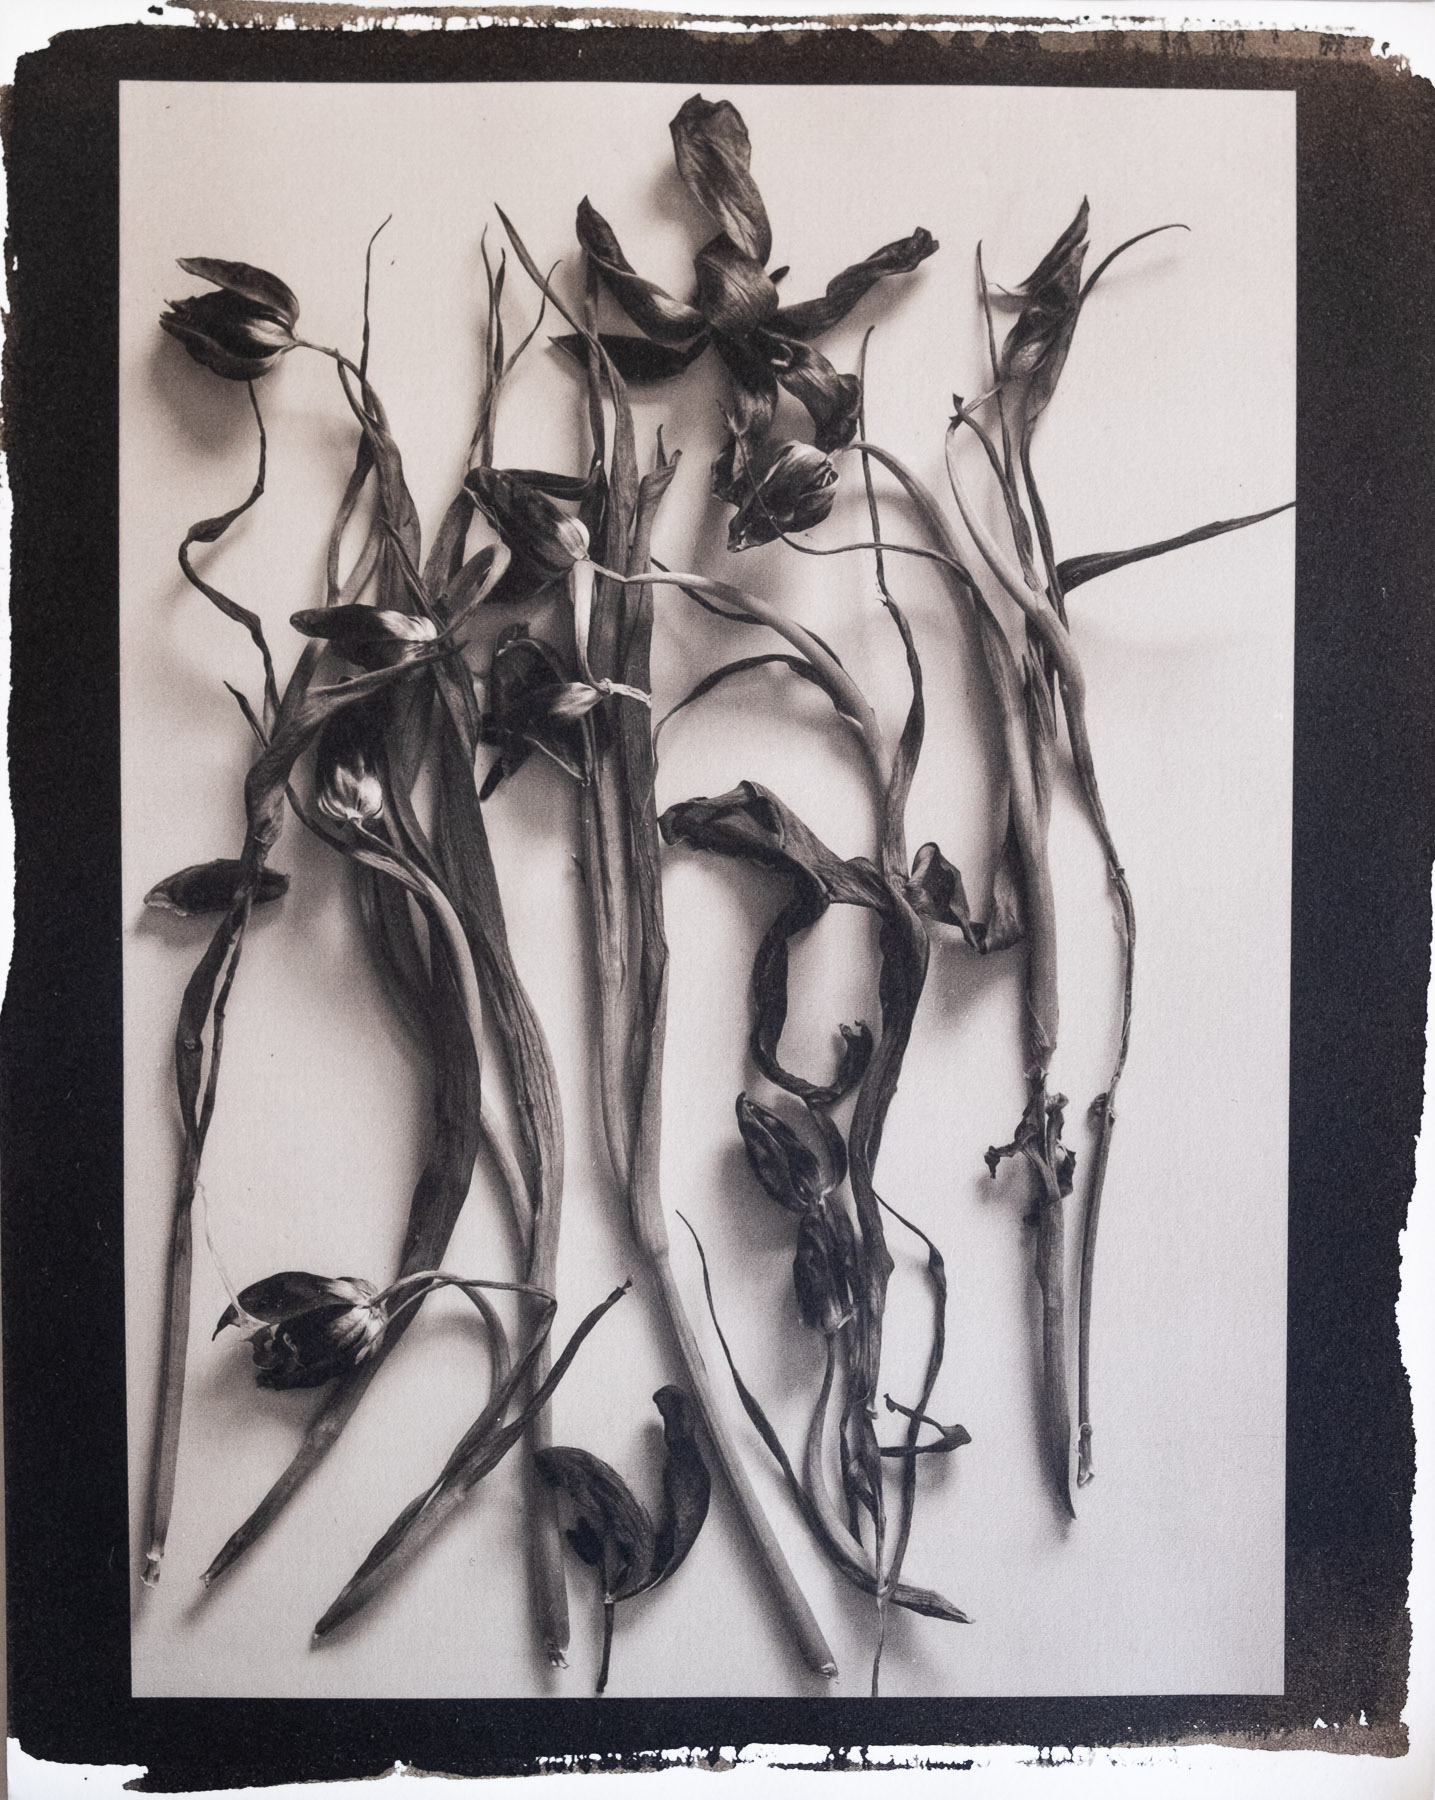 Tulipomania - Platinum Print #flowers #tulips #platinumprint